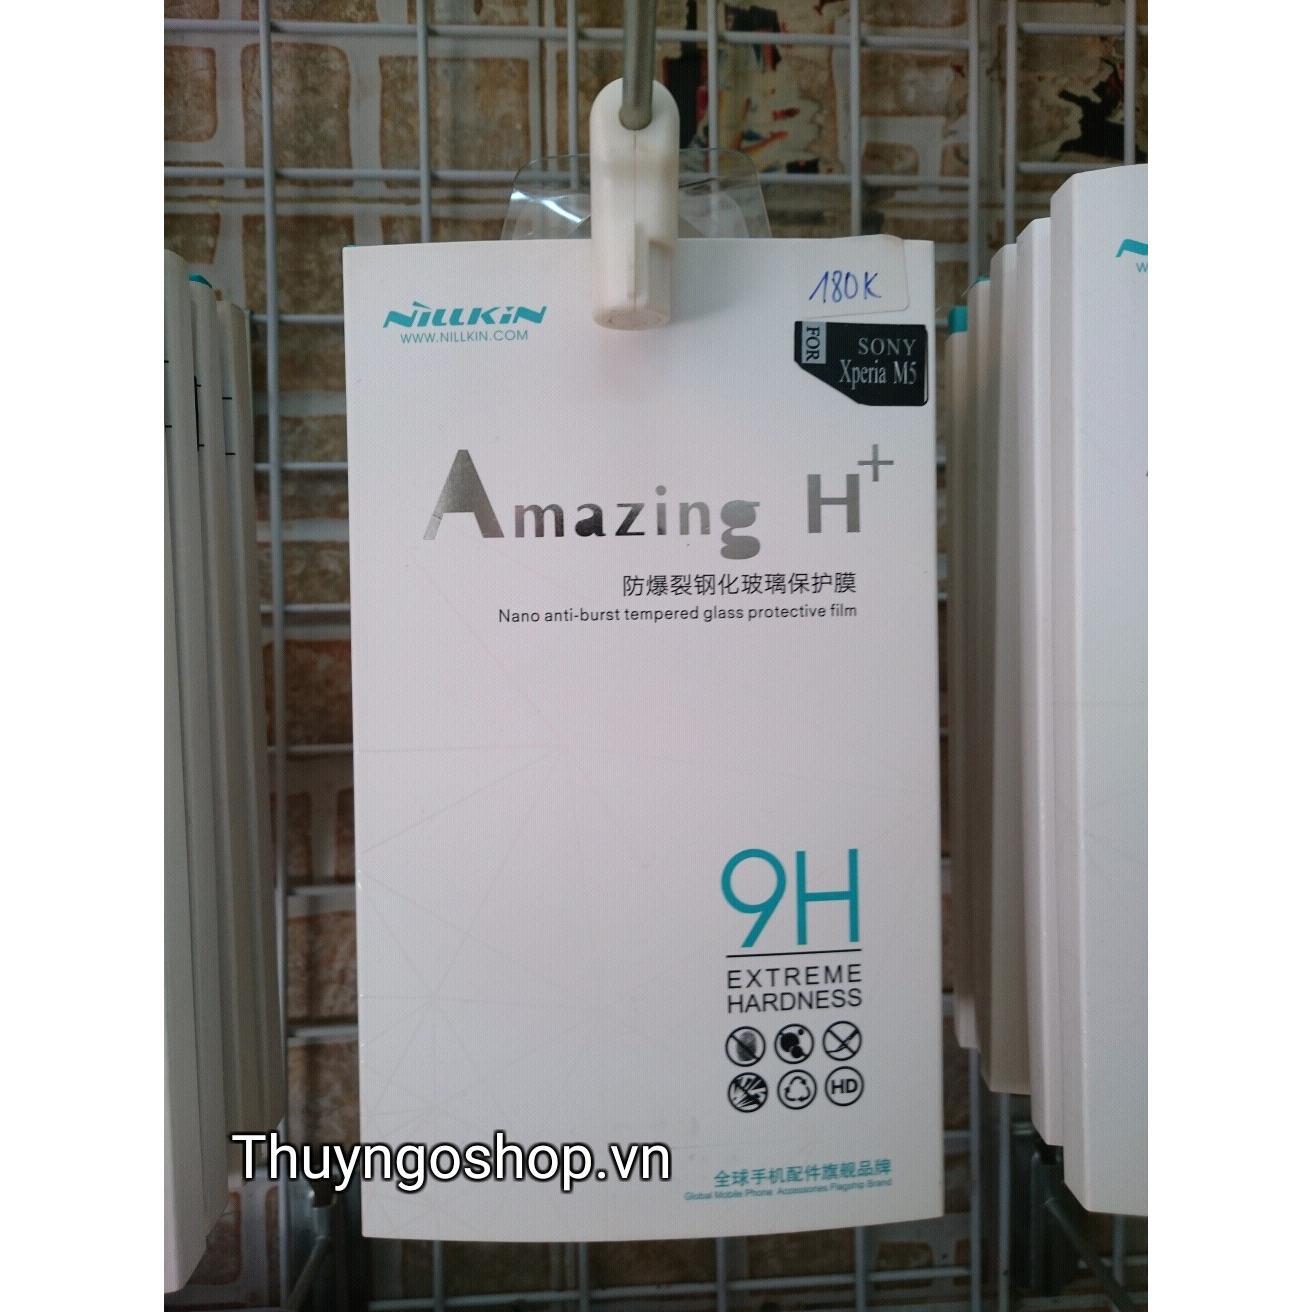 Kính cường lực Nillking Amazing H+ for Sony Xperia M5